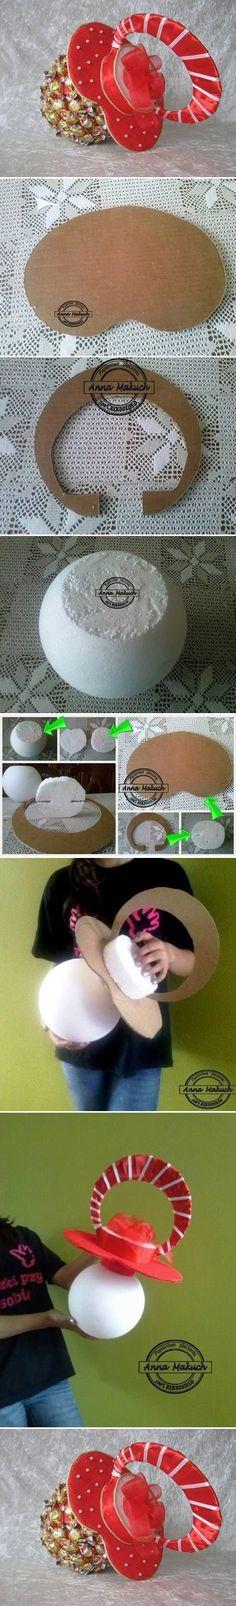 DIY Candy Pacifier candy diy easy crafts diy ideas diy crafts do it yourself…